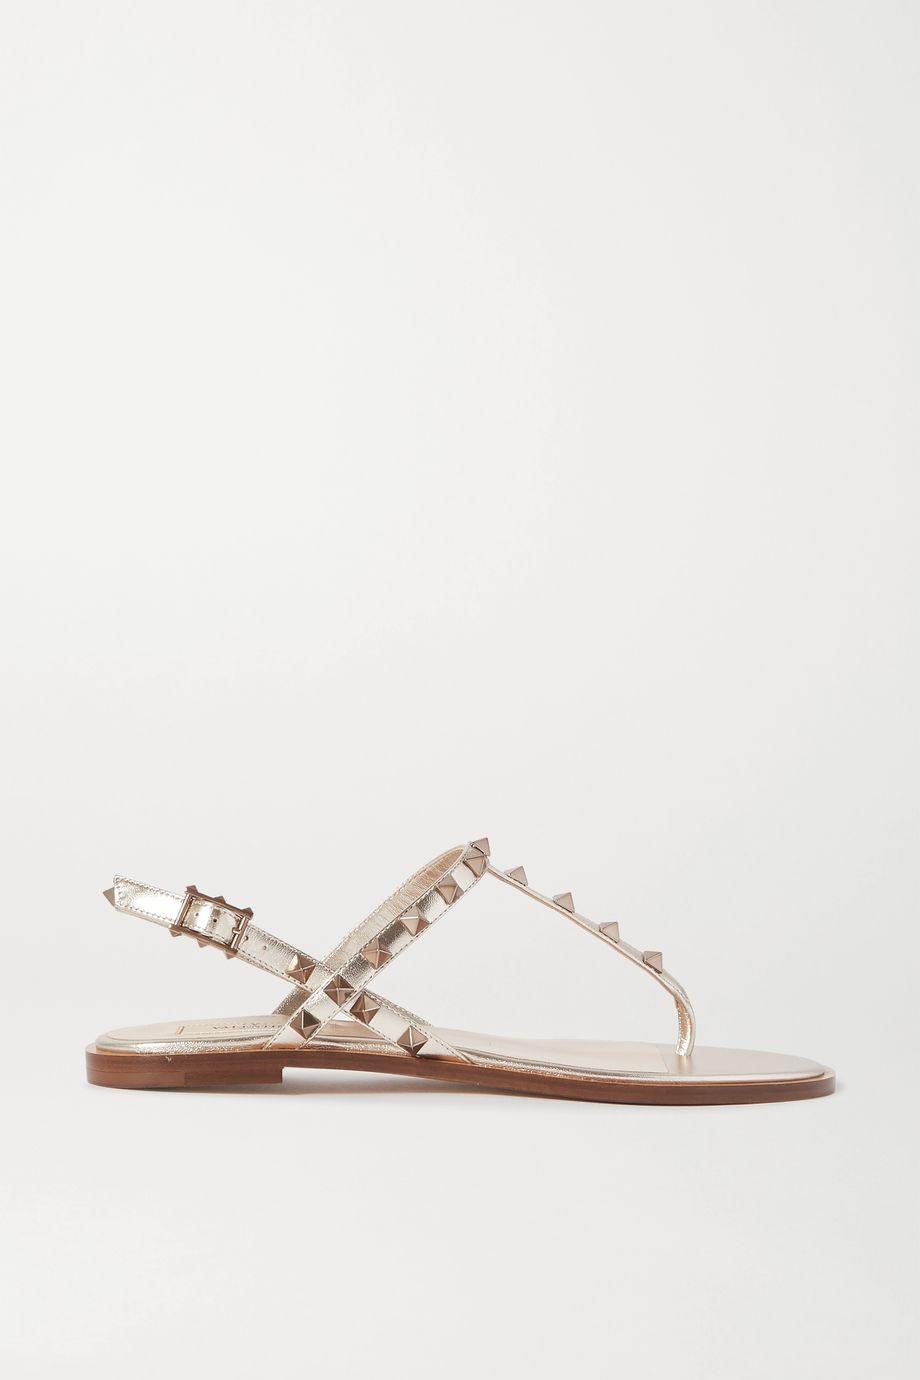 Valentino Valentino Garavani The Rockstud metallic leather sandals